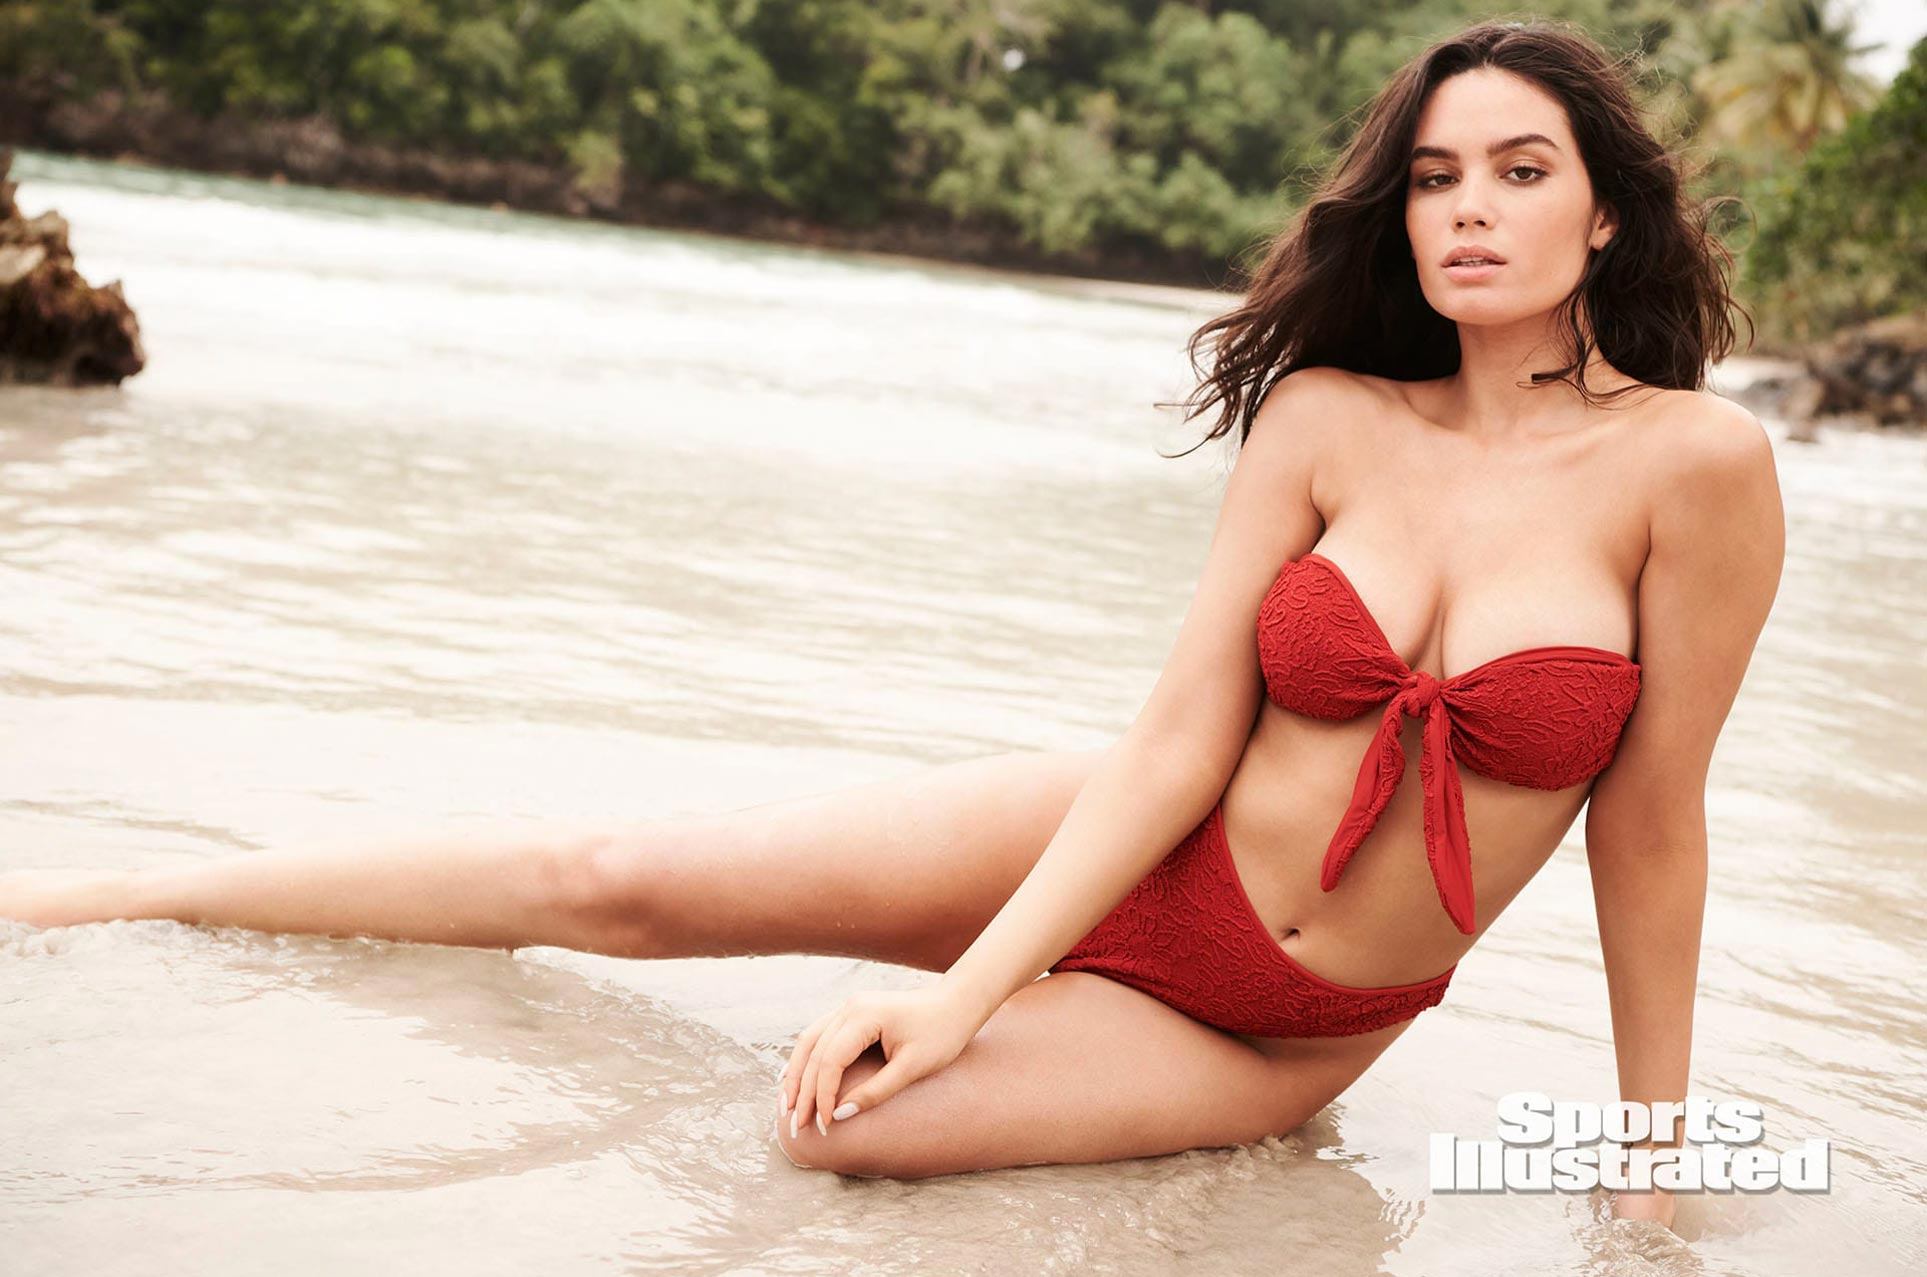 Энн де Паула в каталоге купальников Sports Illustrated Swimsuit 2020 / фото 10